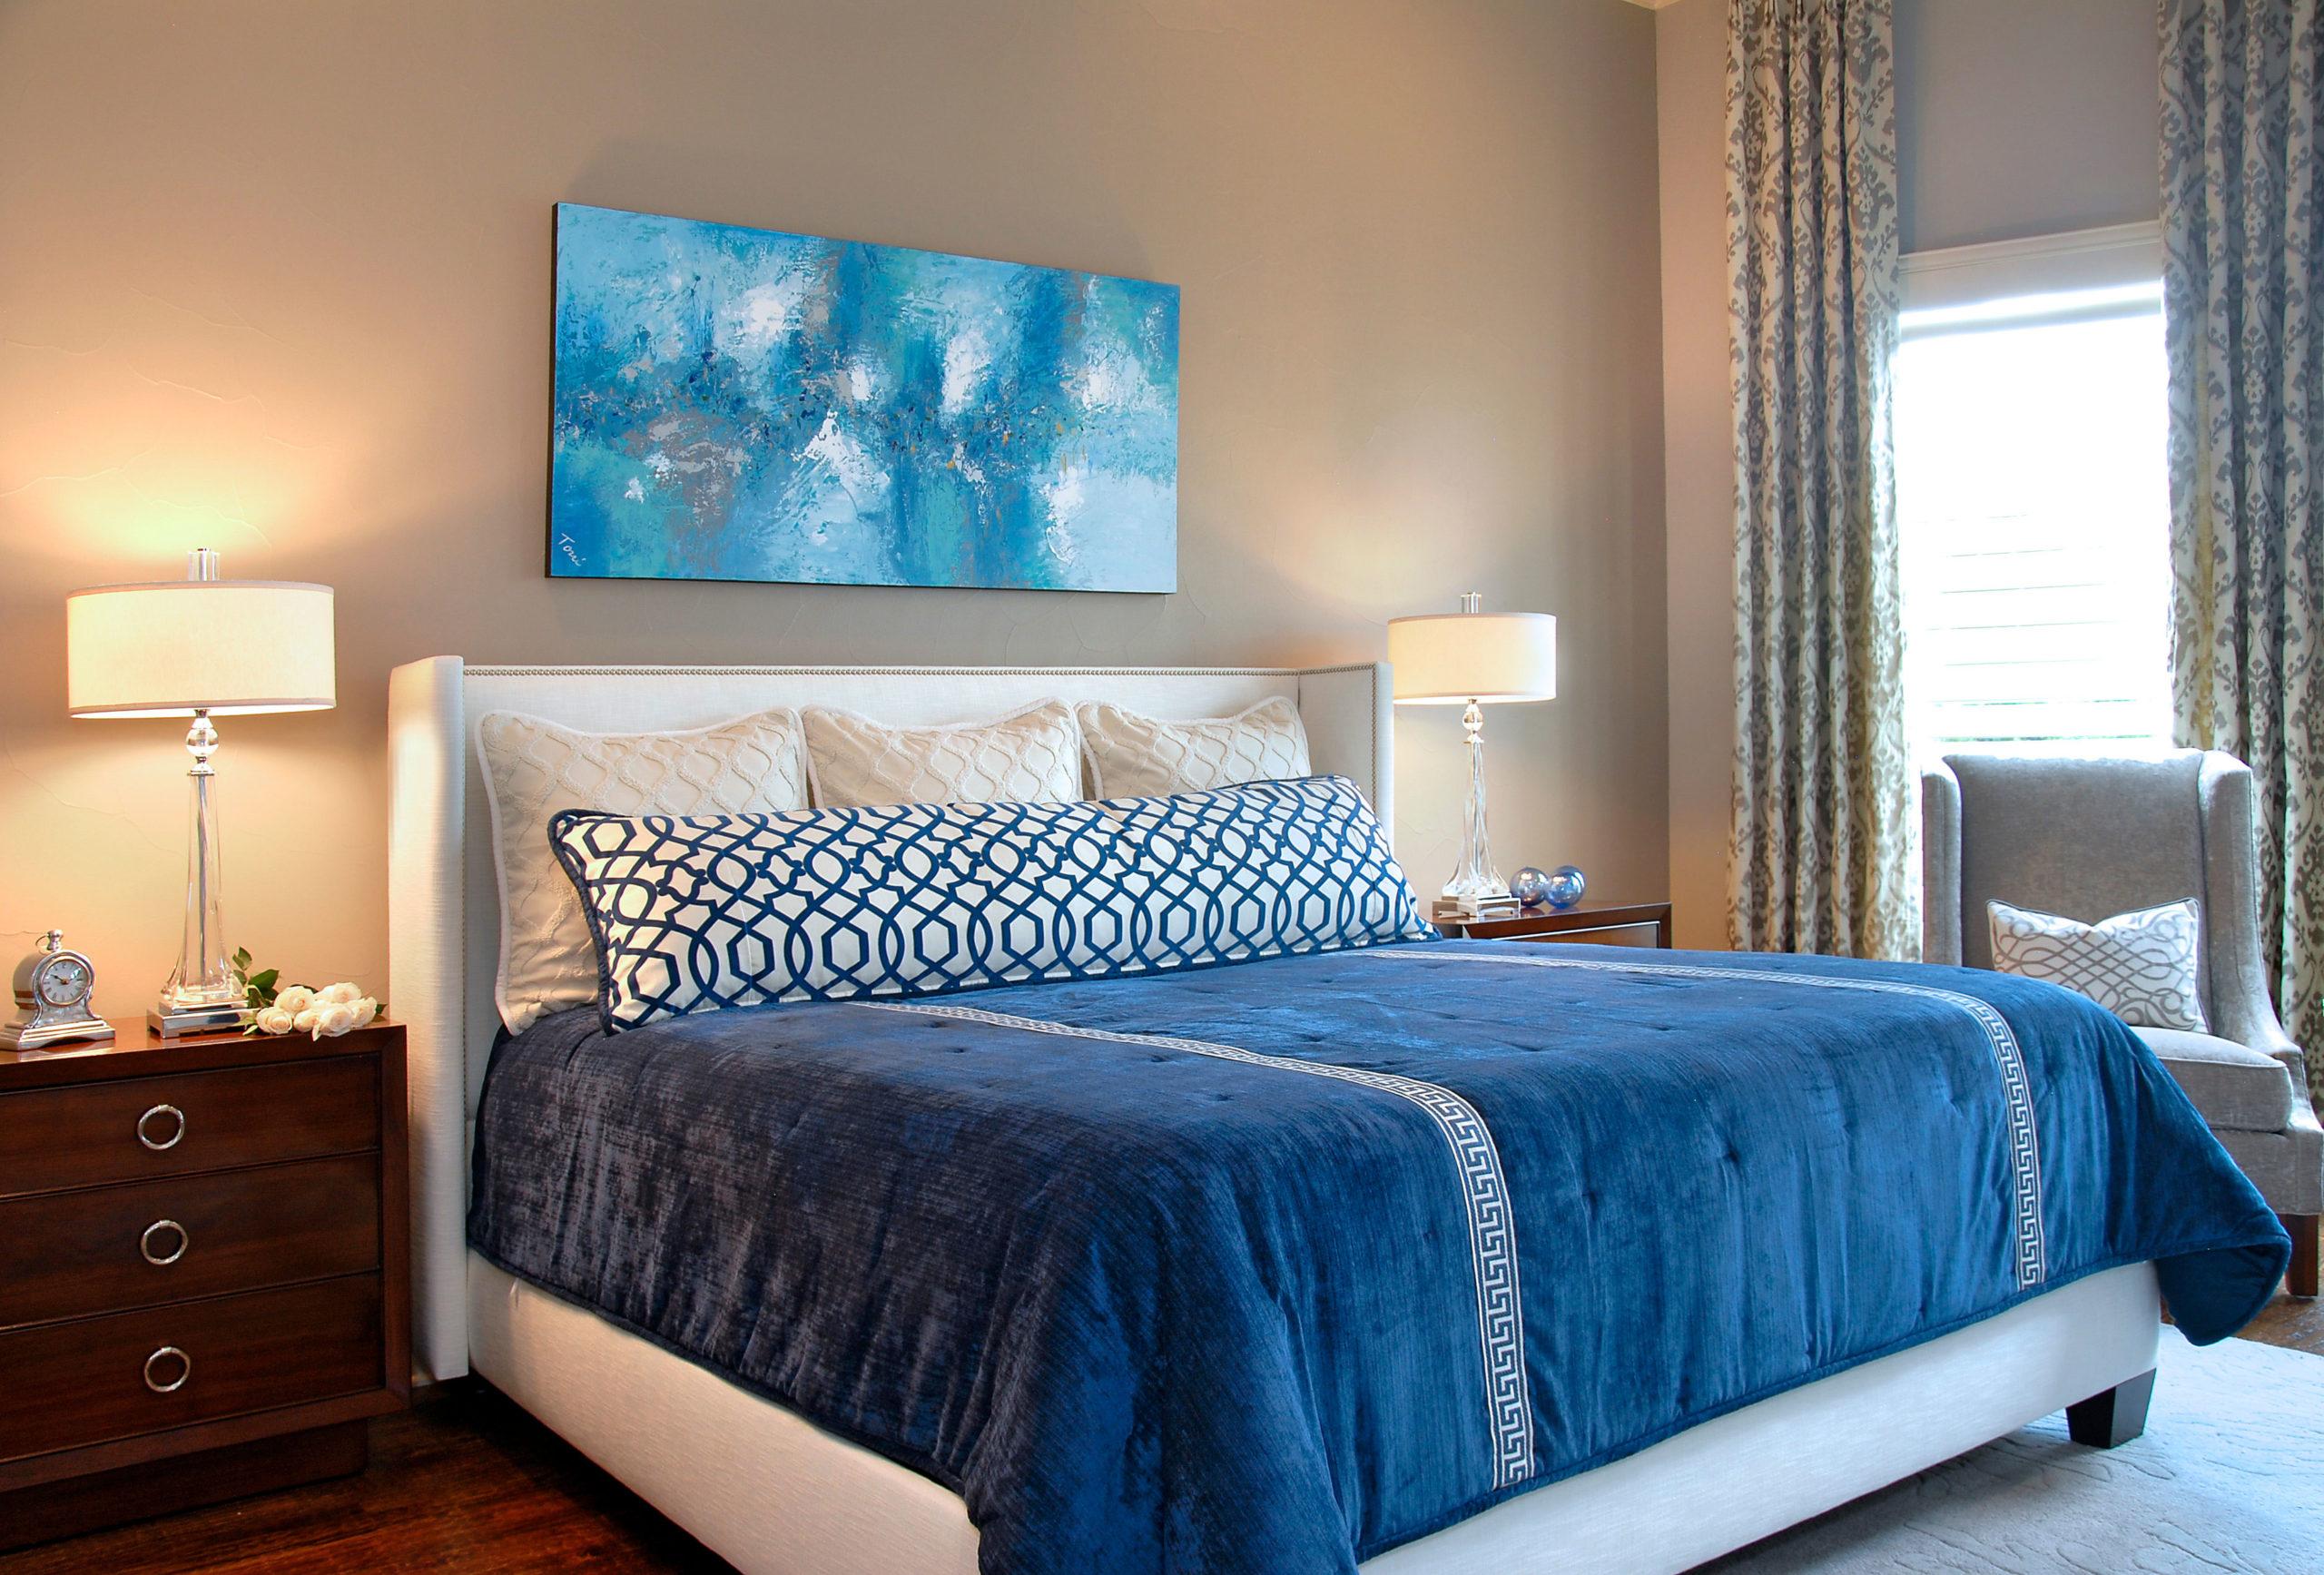 Ocean Dreaming Of Deep Sea Diving 4 - Dallas Interior Designer serving Plano, Frisco, Dallas, Allen for Decorating Den Interiors D'KOR HOME by Dee Frazier Interiors